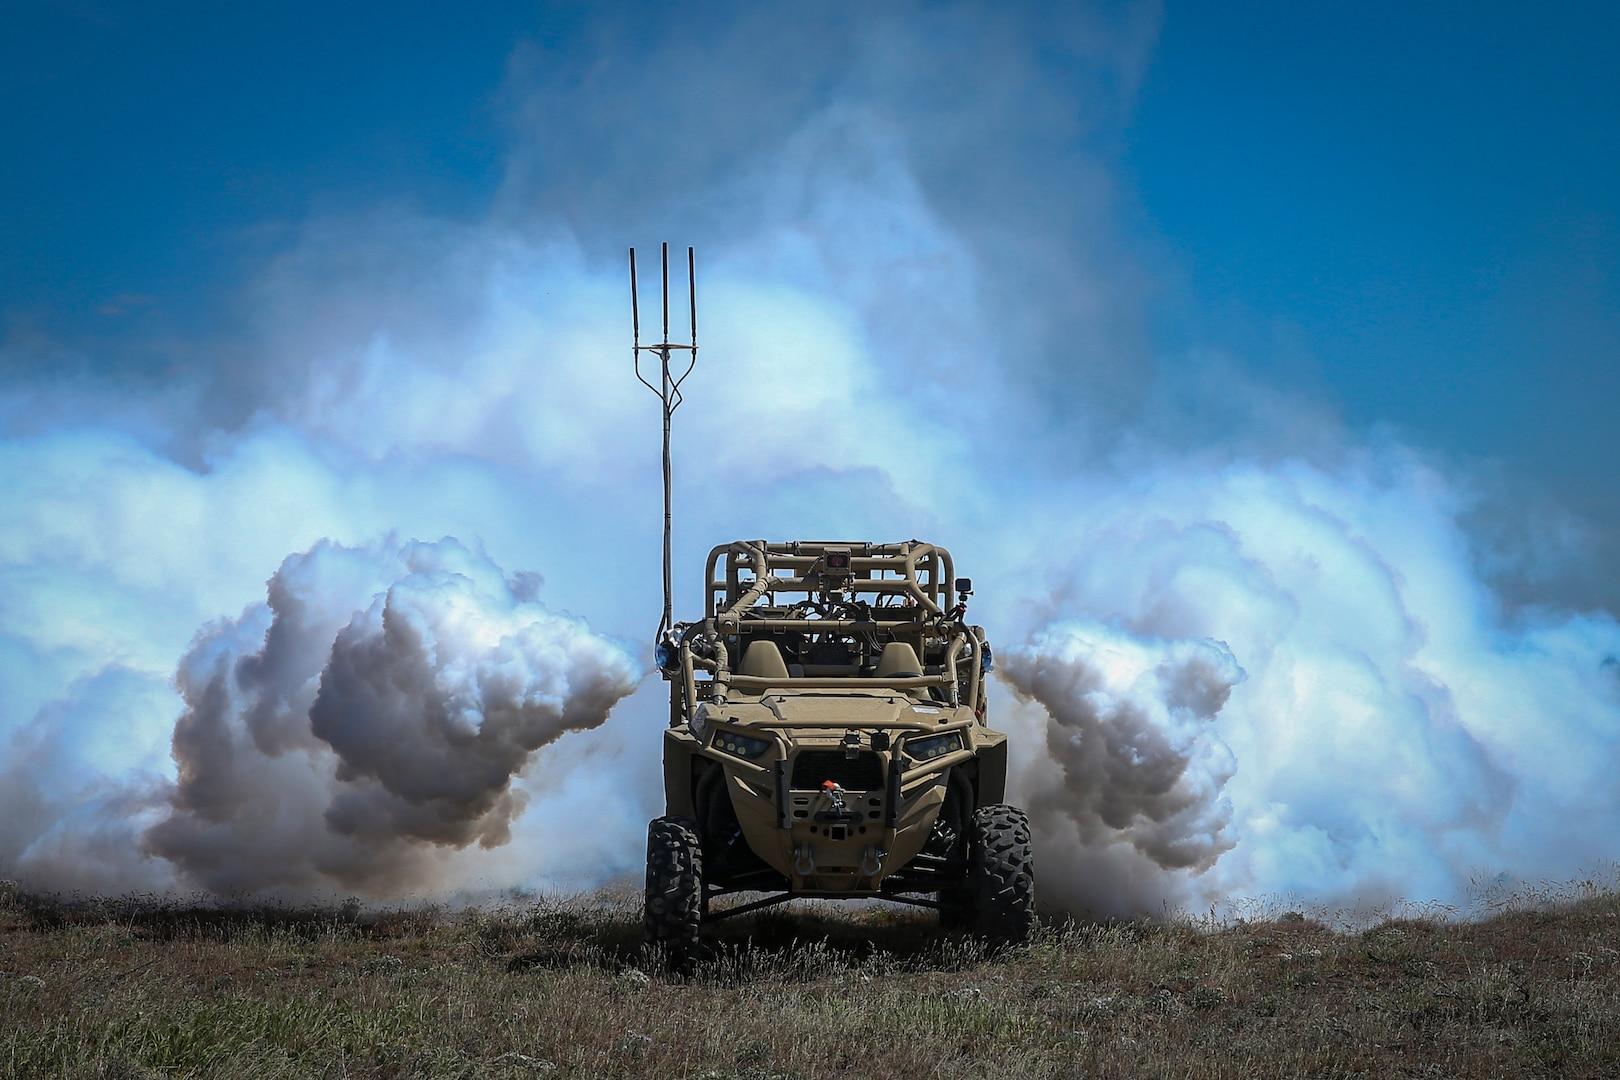 Screening Obscuration Module attached to Utility Task Vehicle activates autonomously during Robotic Complex Breach Concept on Yakima Training Center, Yakima, Washington, April 26, 2019 (U.S. Marine Corps/Nathaniel Q. Hamilton)